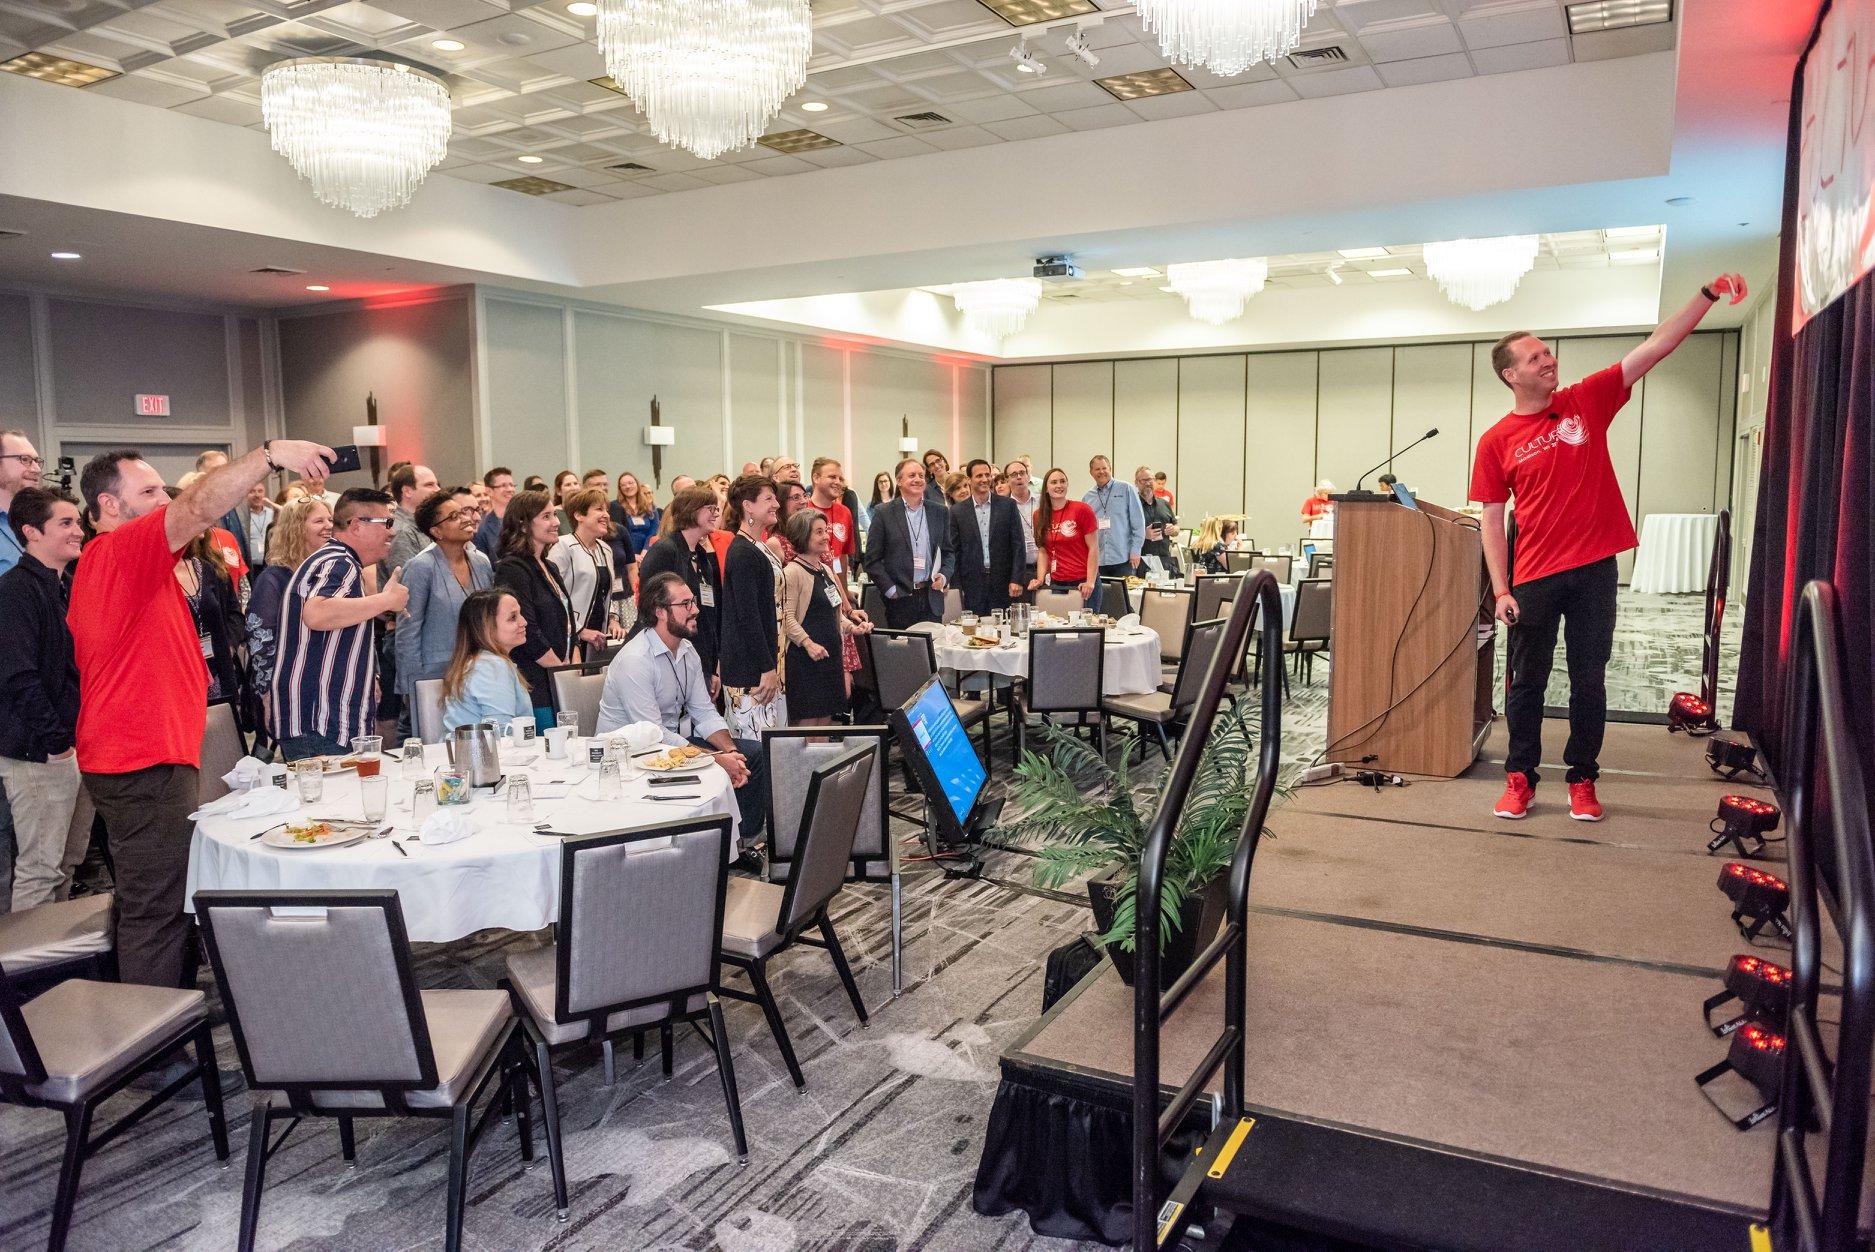 Workplace culture conference CultureCon 2019